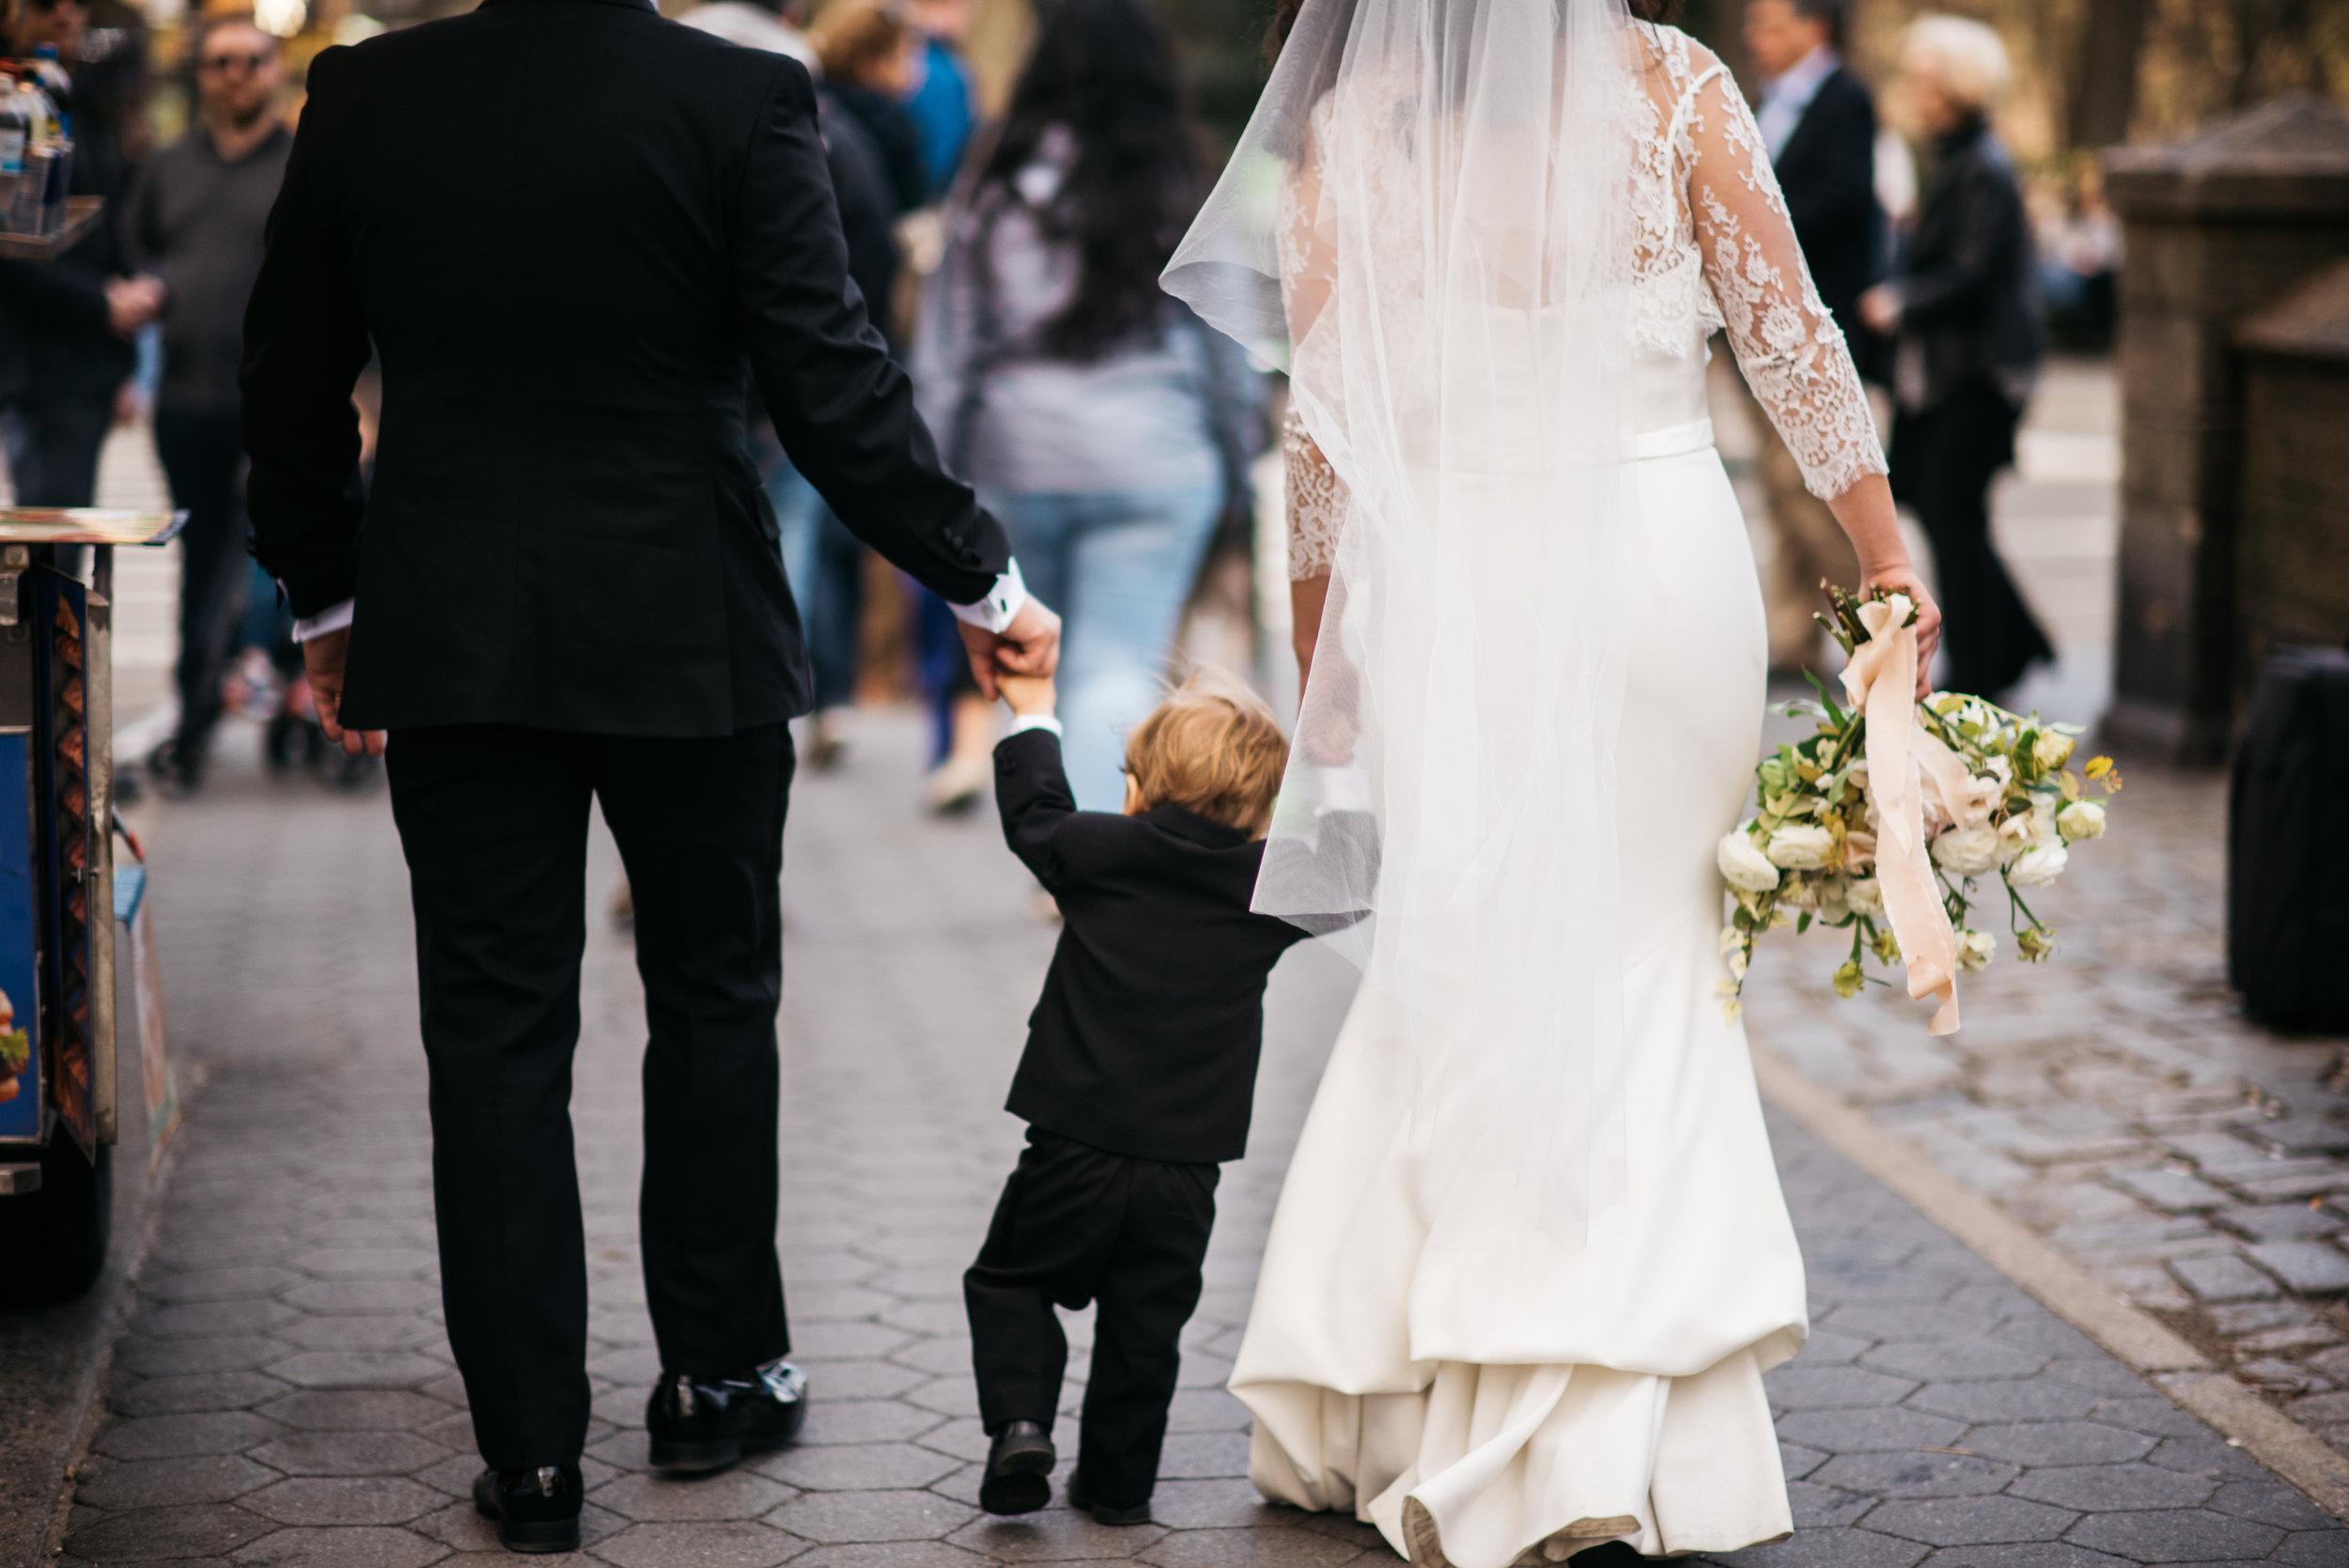 WeddingPhotos | NJPhotographer | Highlights-1-60.jpg